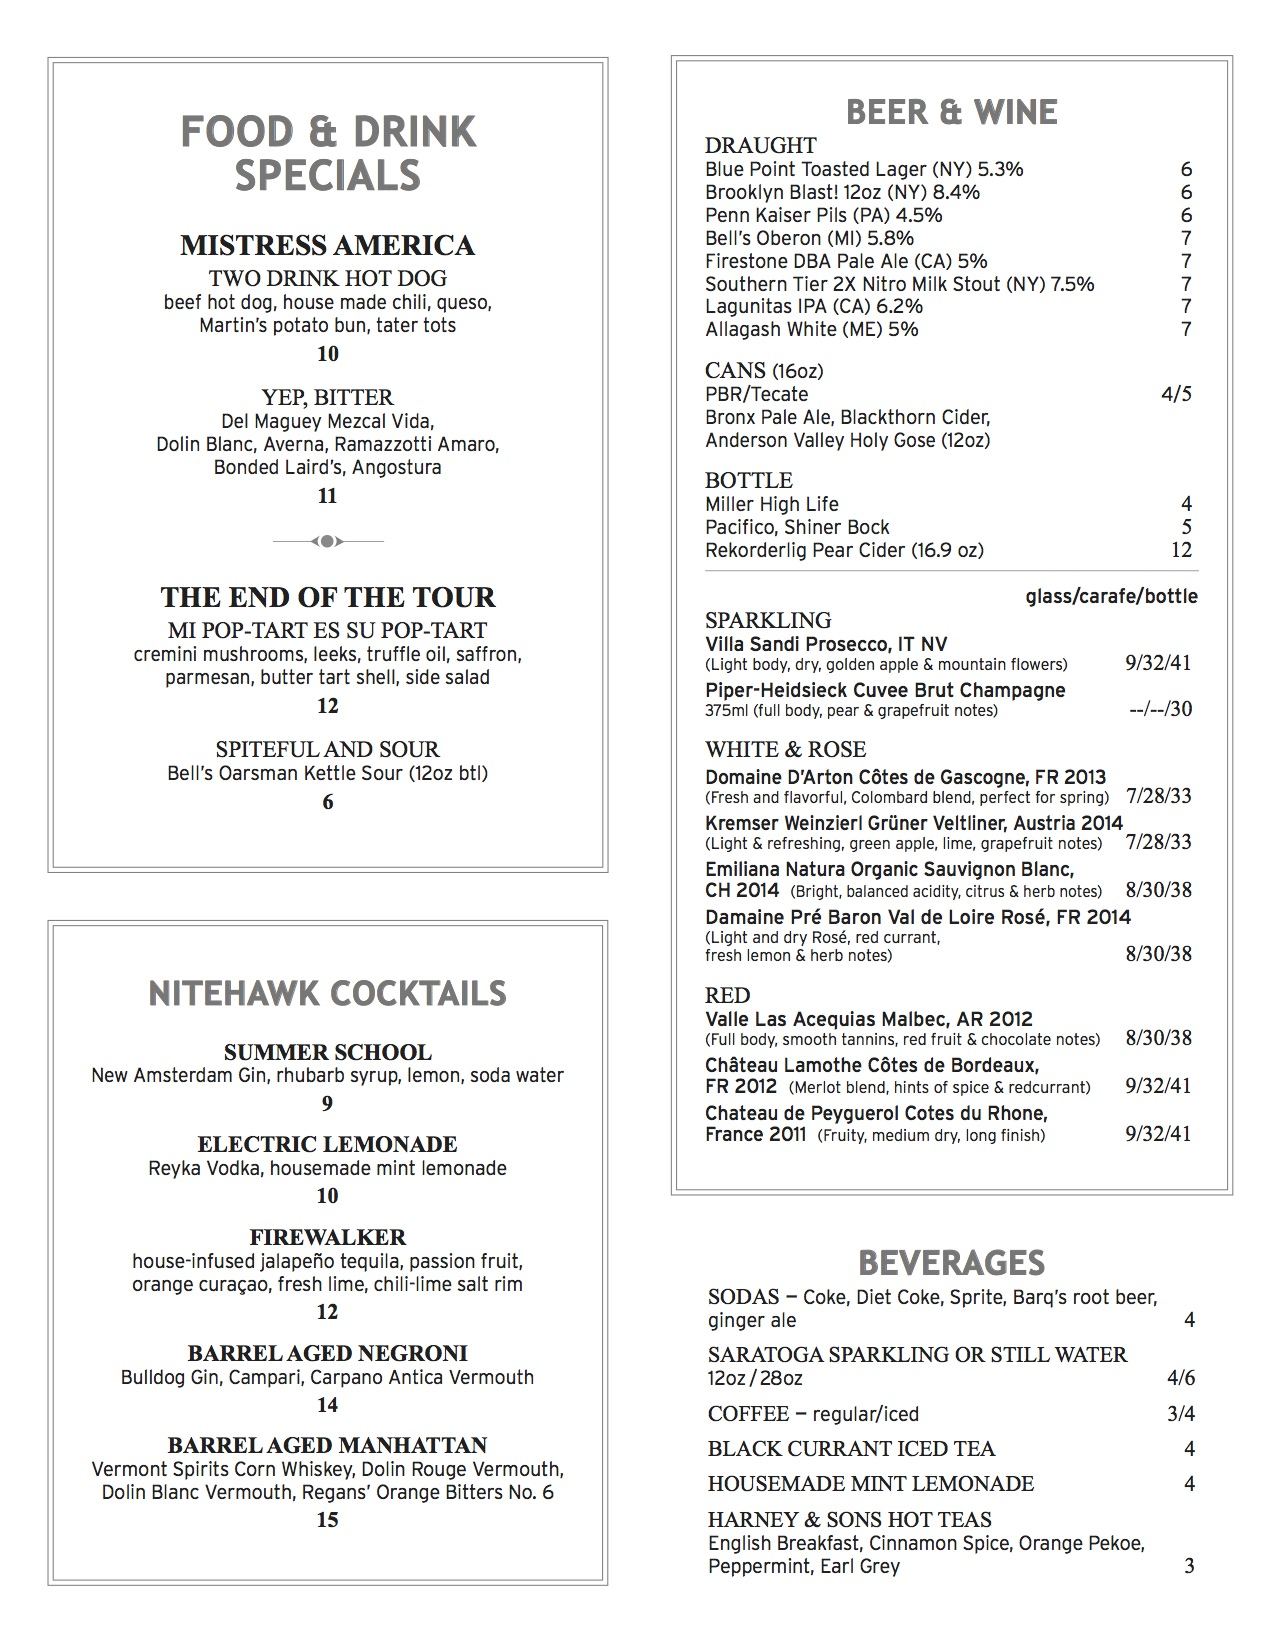 NH_Dinner menu 8.21.15